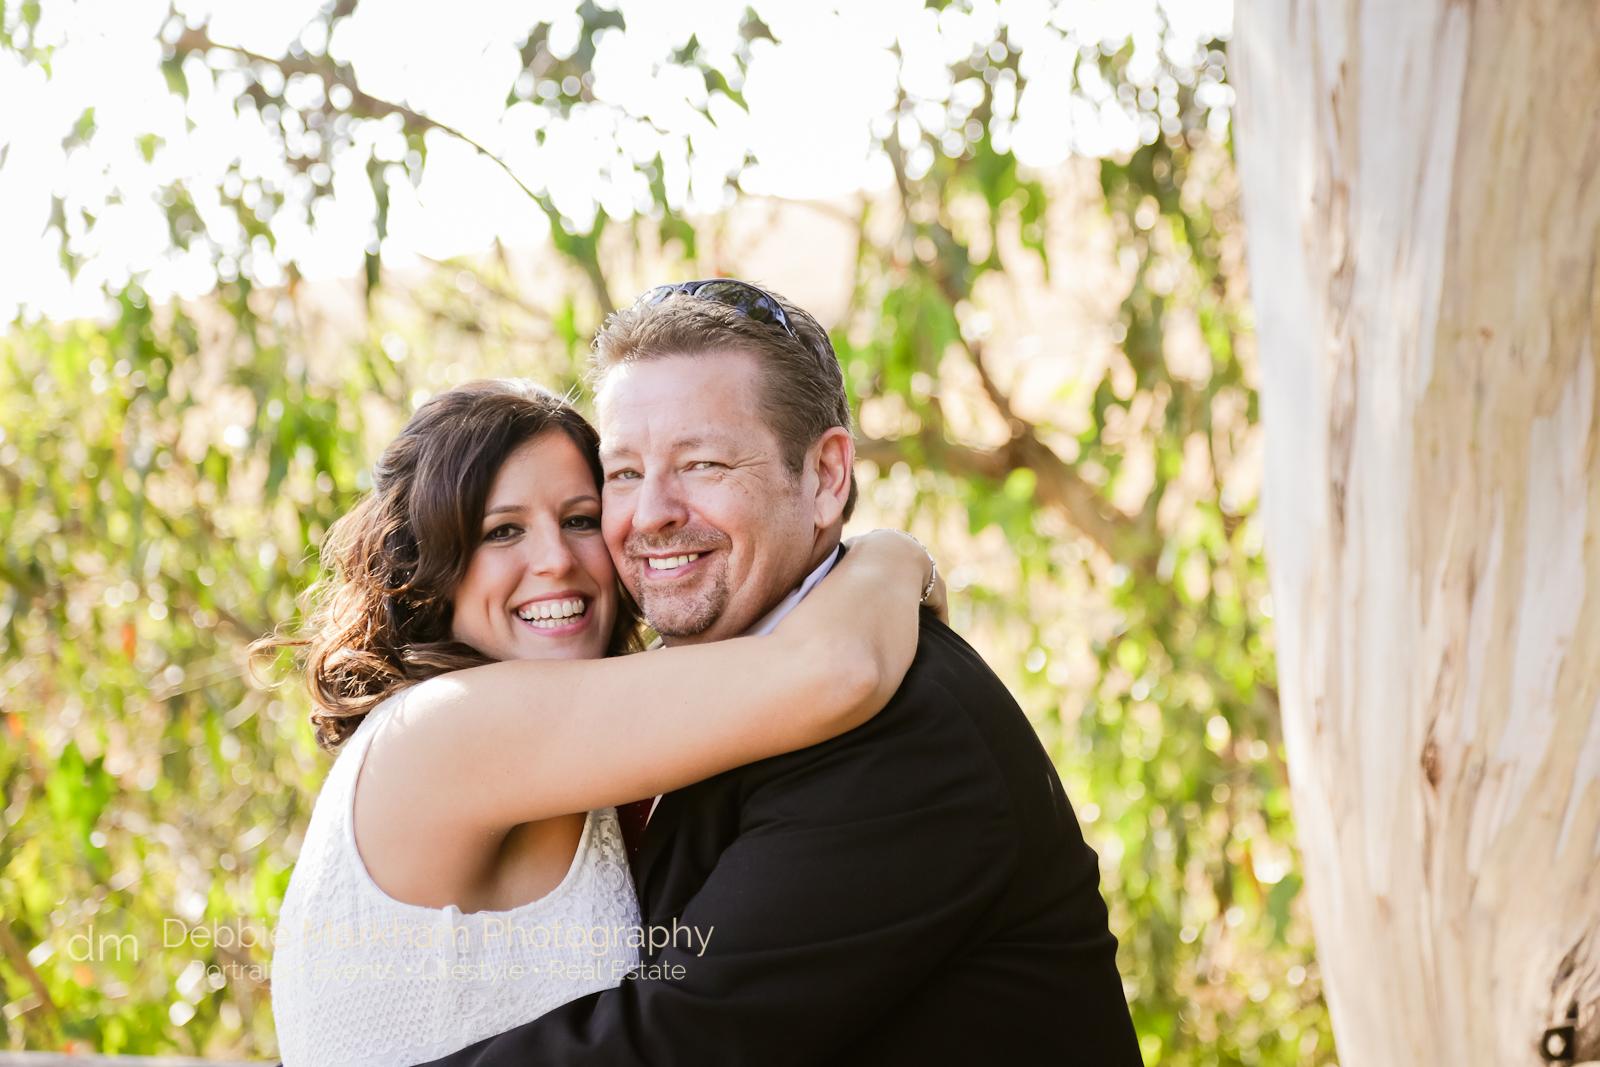 Debbie-Markham-Photography_Small-Town-Wedding_Destination-Wedding_California_Central-Coast-2012.jpg